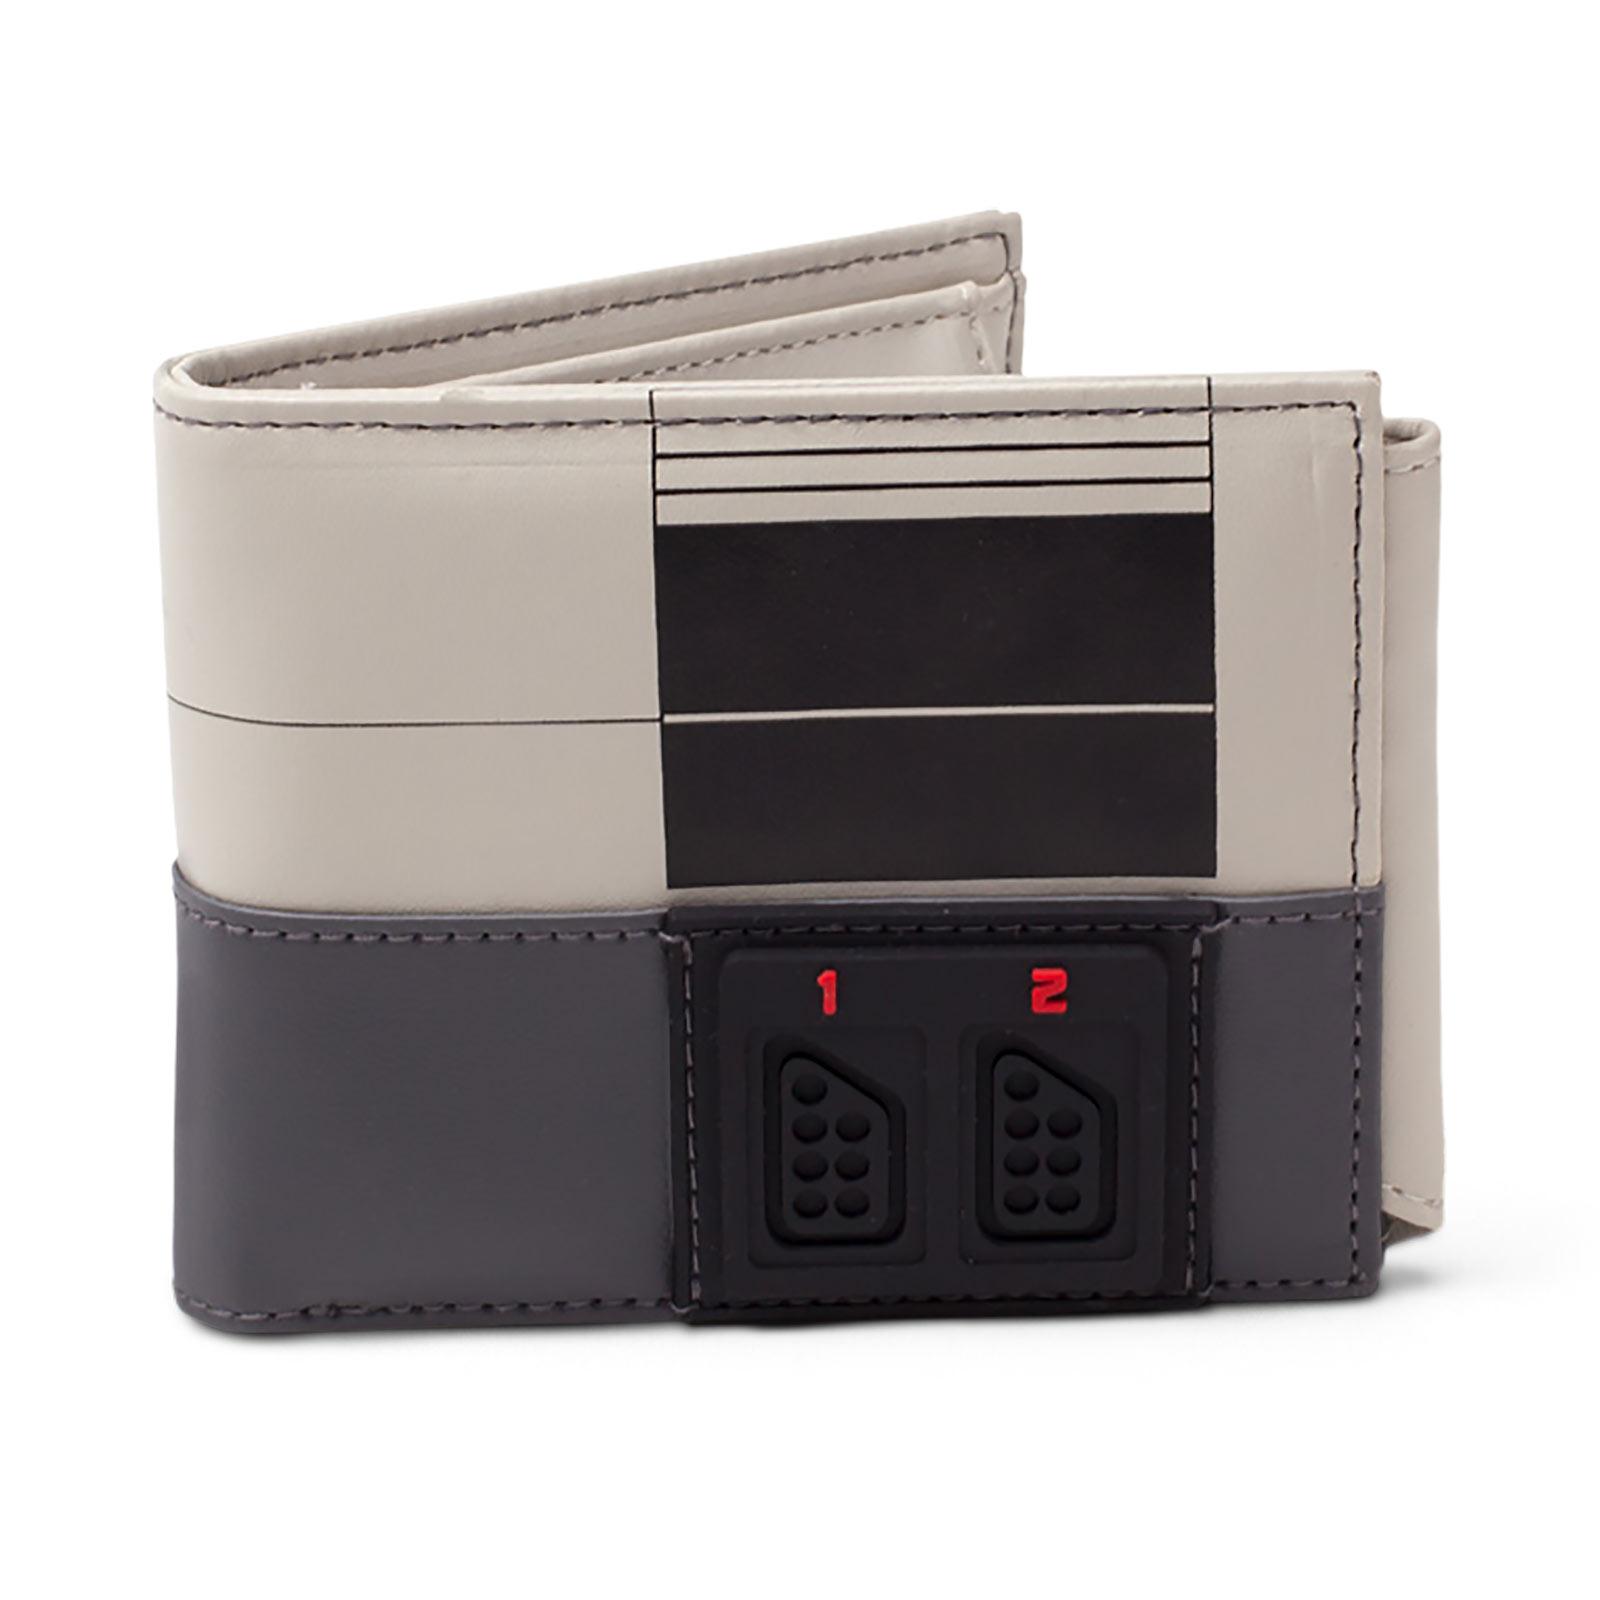 Nintendo - NES Konsole Geldbörse grau